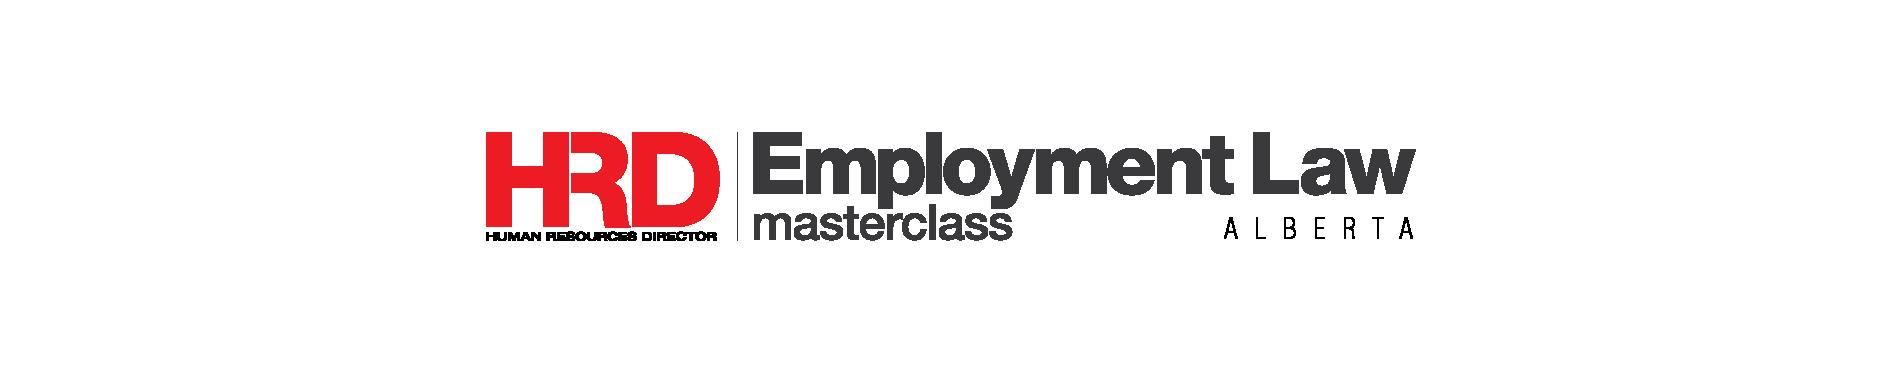 Employment Law Masterclass Alberta